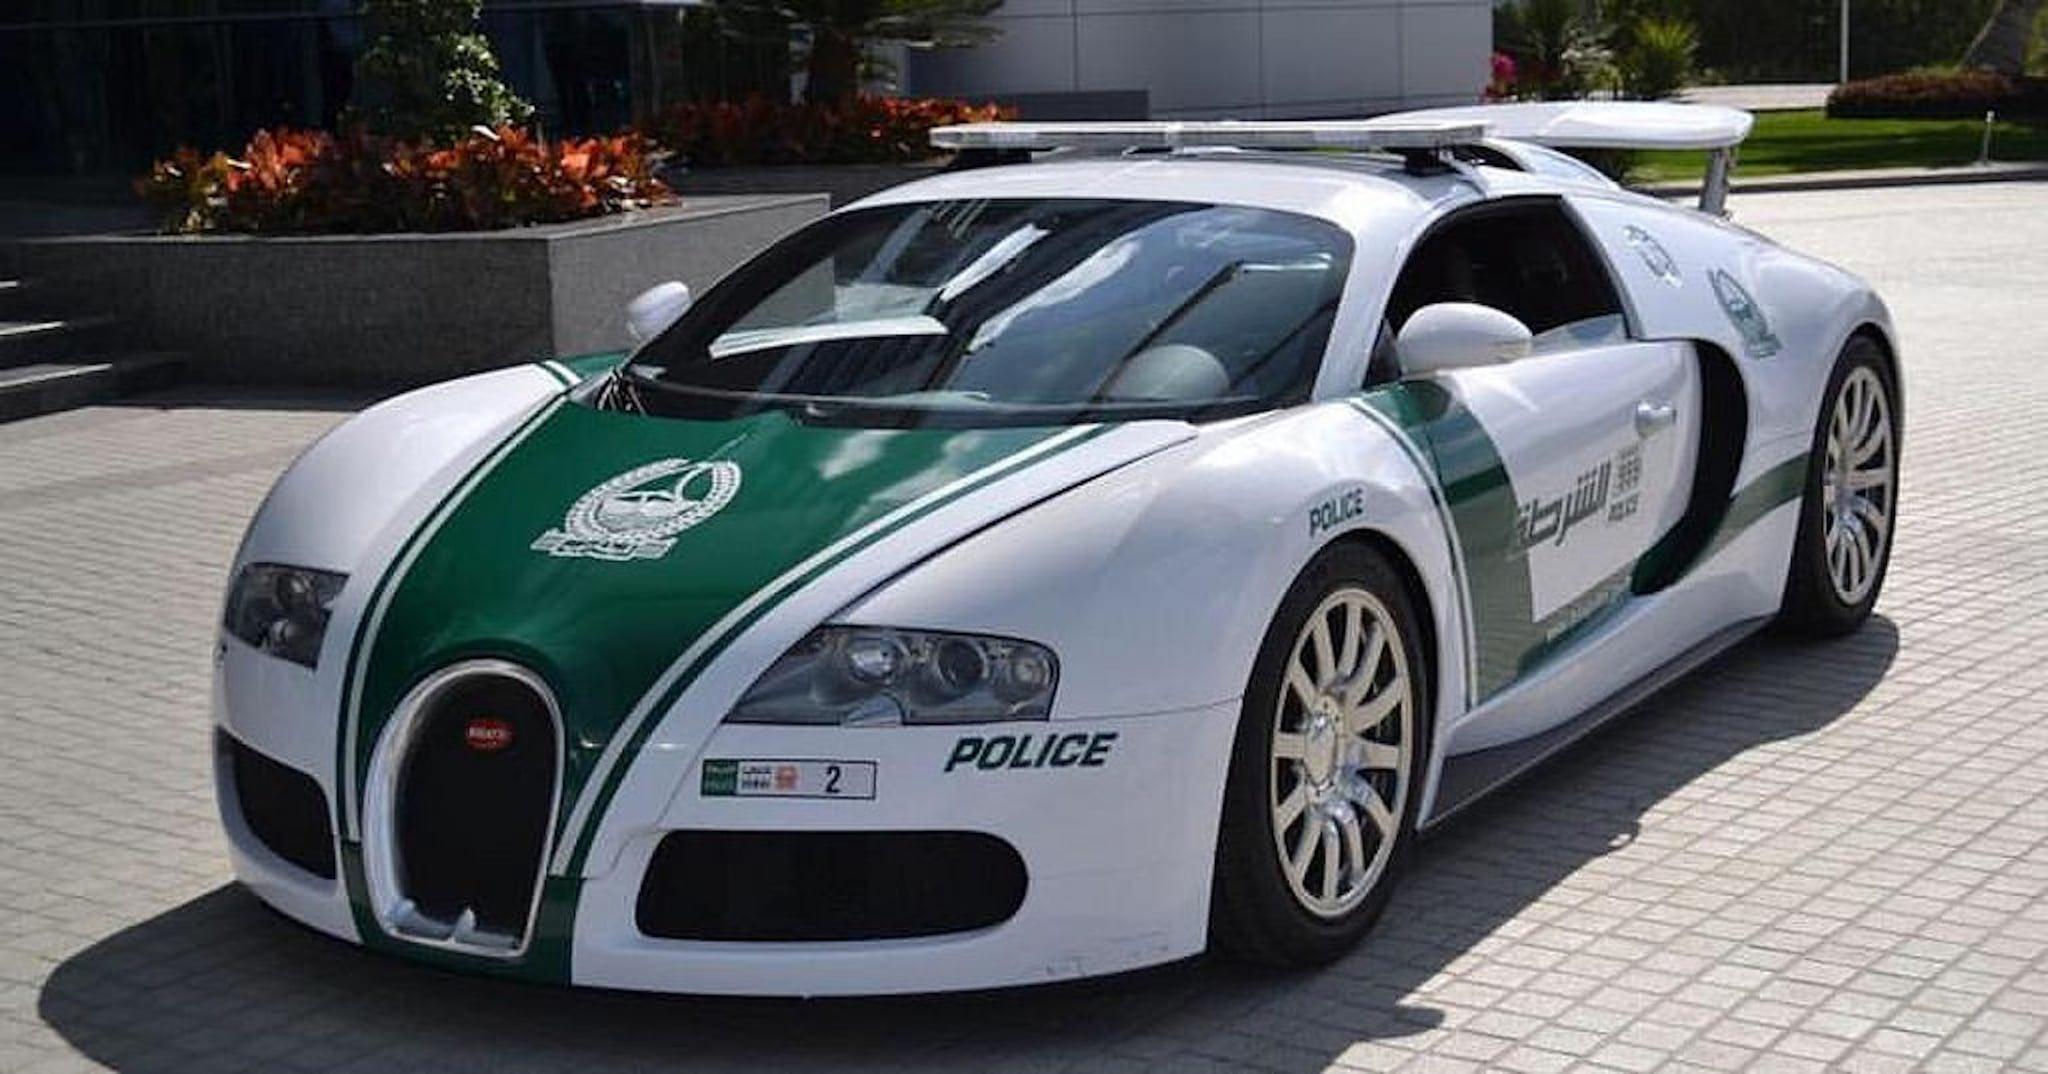 Картинки по запросу carros da policia do qatar